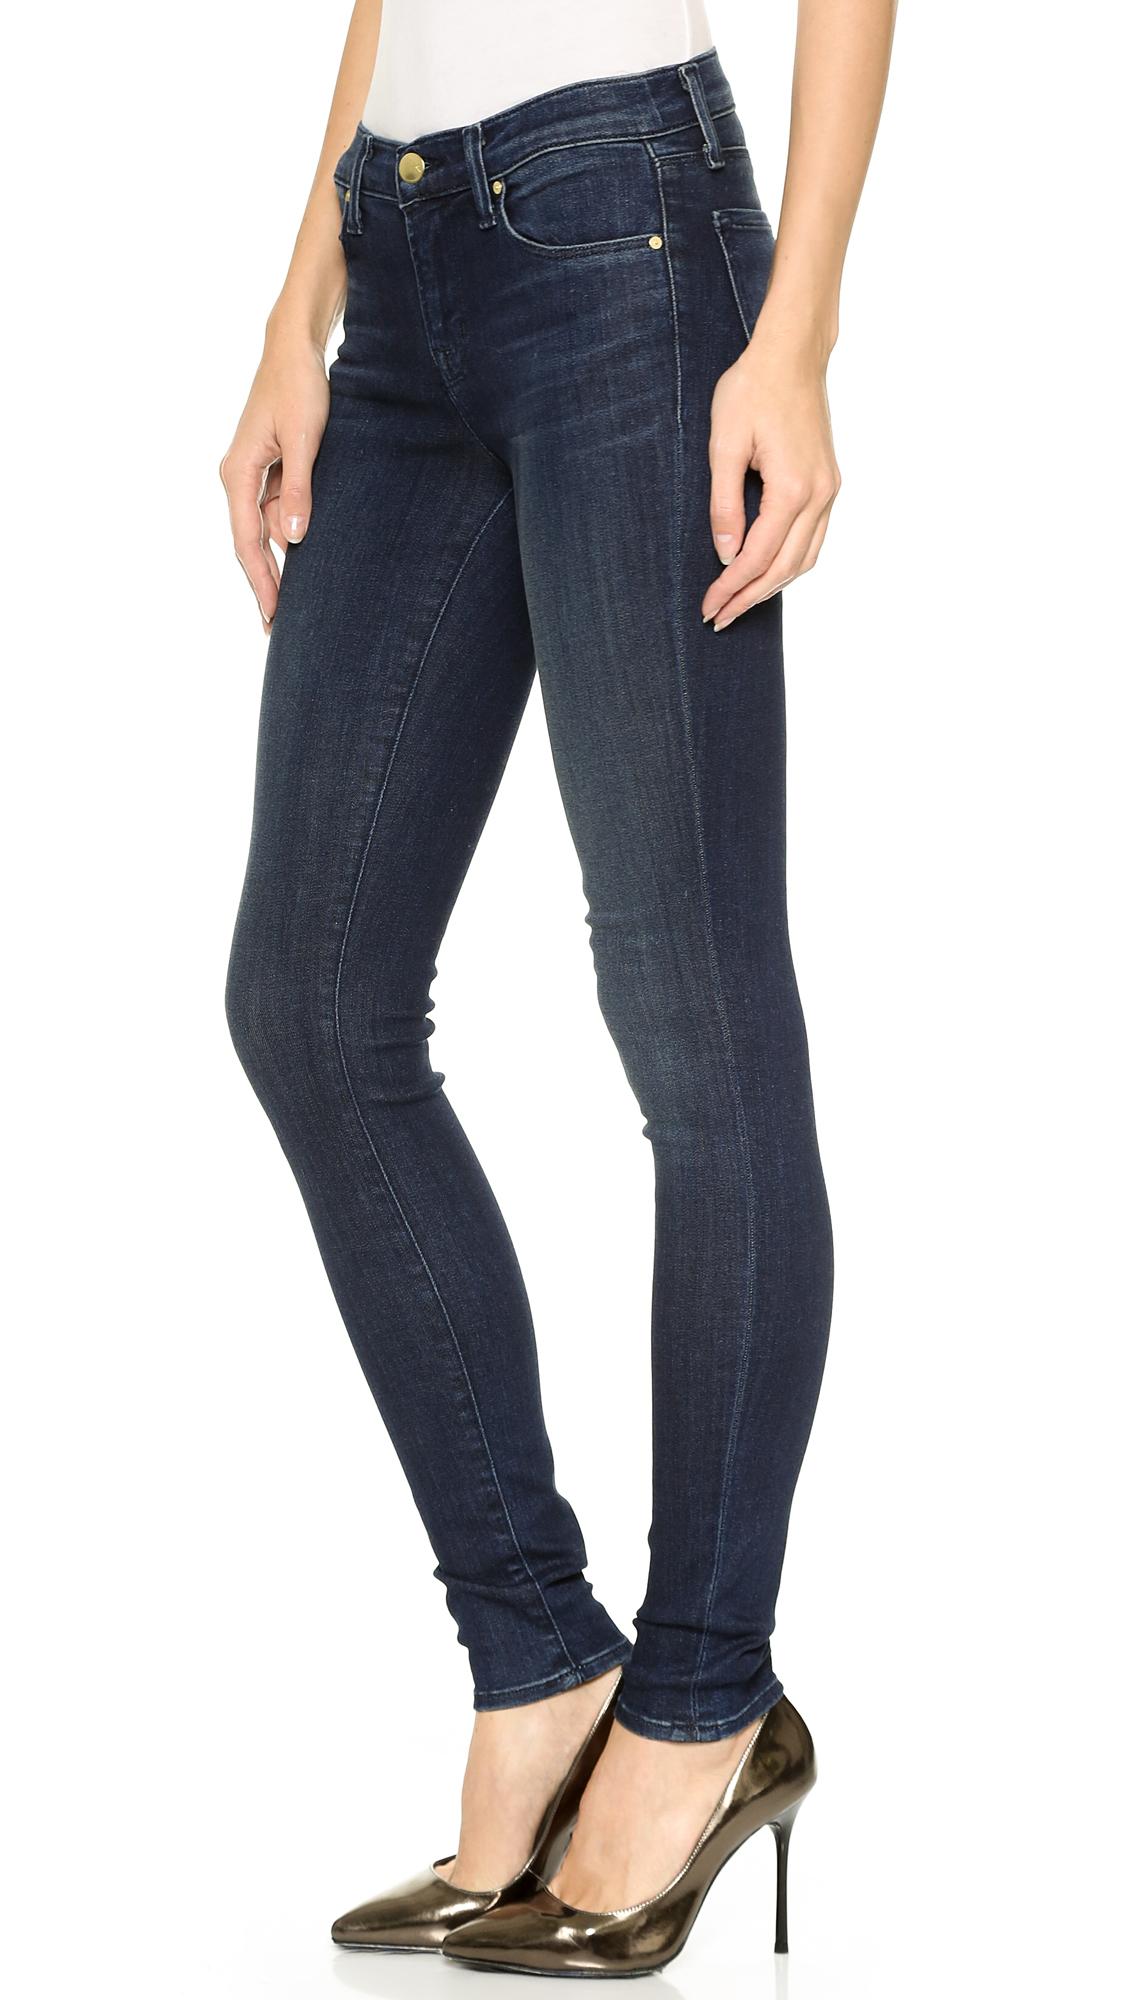 09ace763d934 Lyst - J Brand 620 Mid Rise Super Skinny Jeans - Fix in Blue